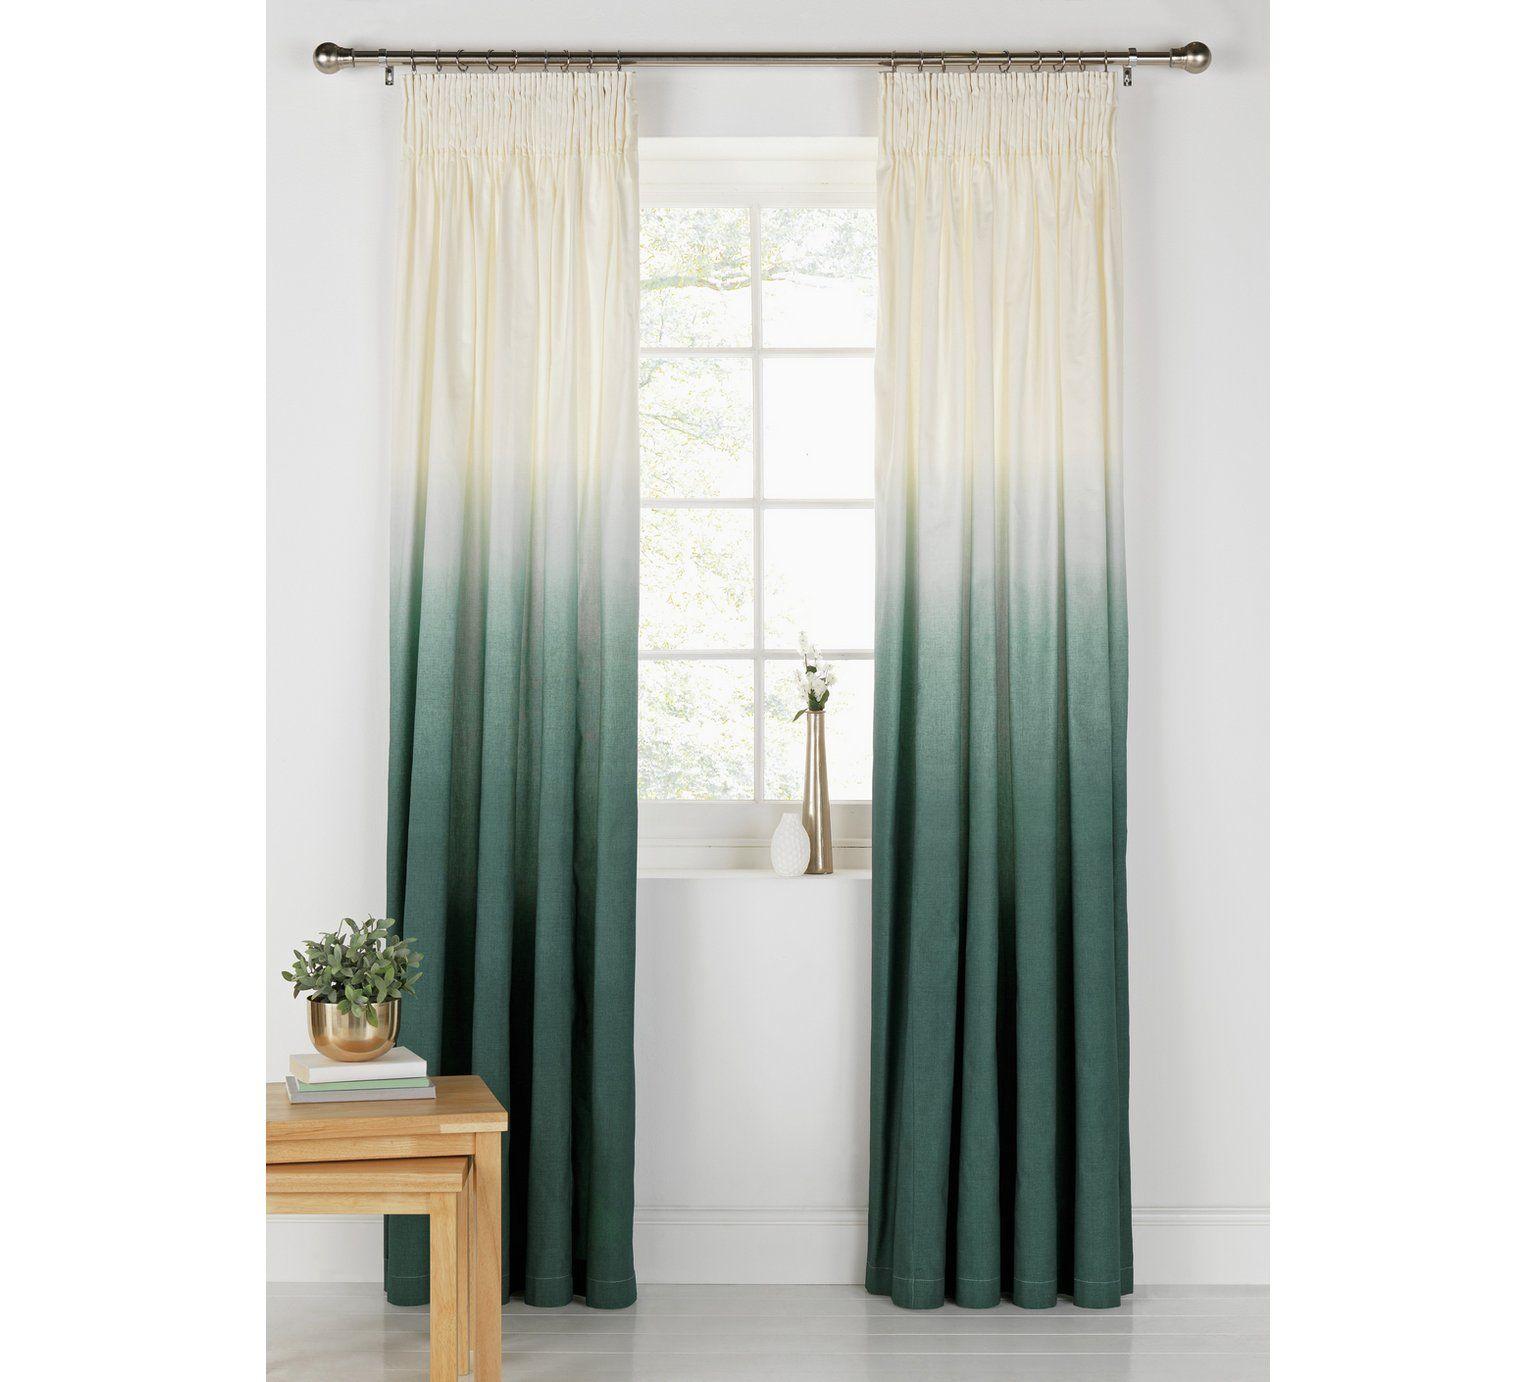 Argos Blinds And Curtains Www Stkittsvilla Com